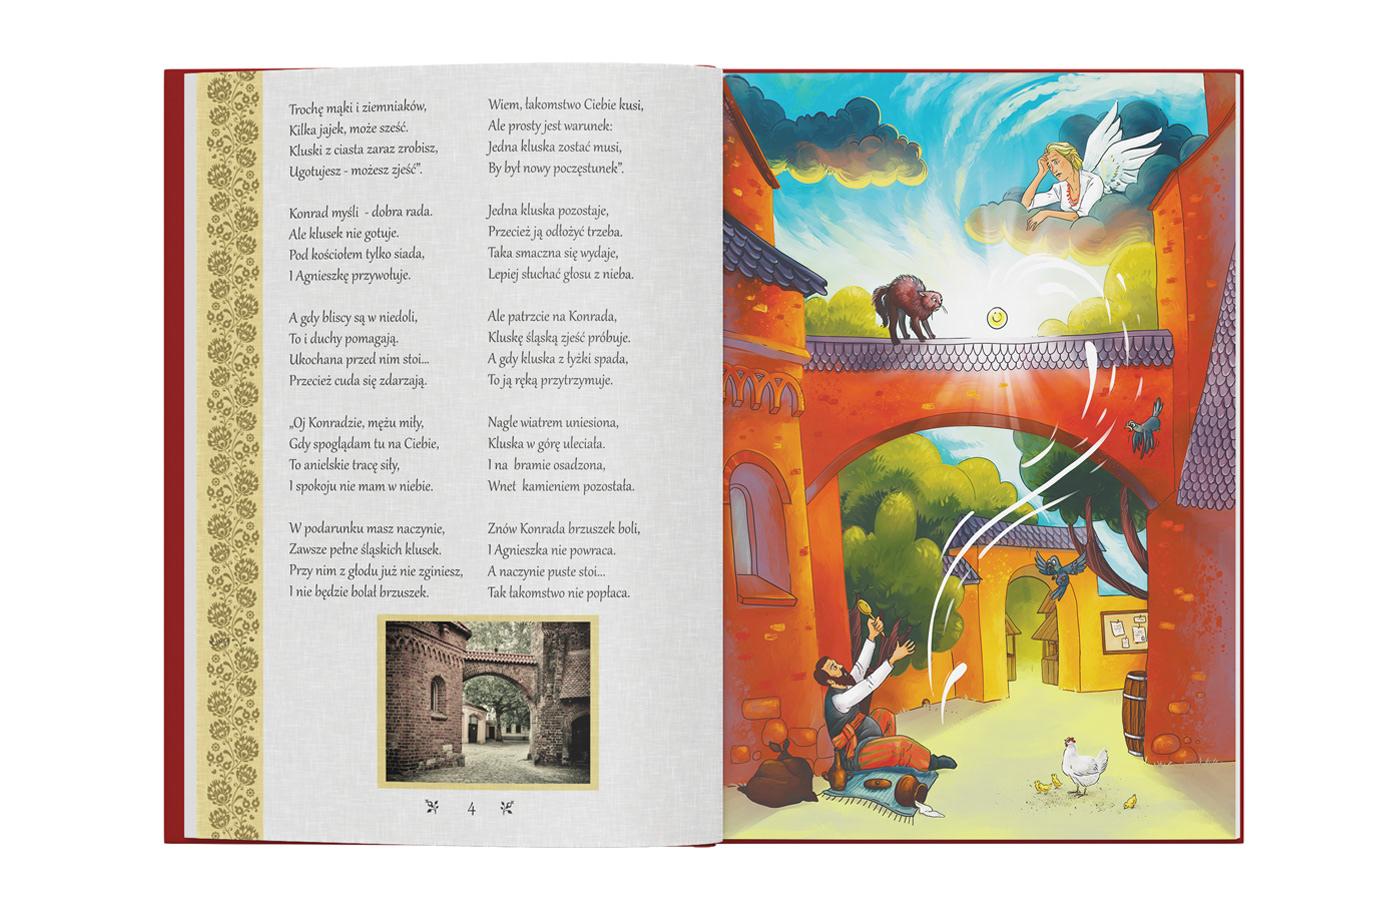 book Character children book children illustration childrenbook childrensbook kidlit kidlitart Kidsbook visualdevelopment